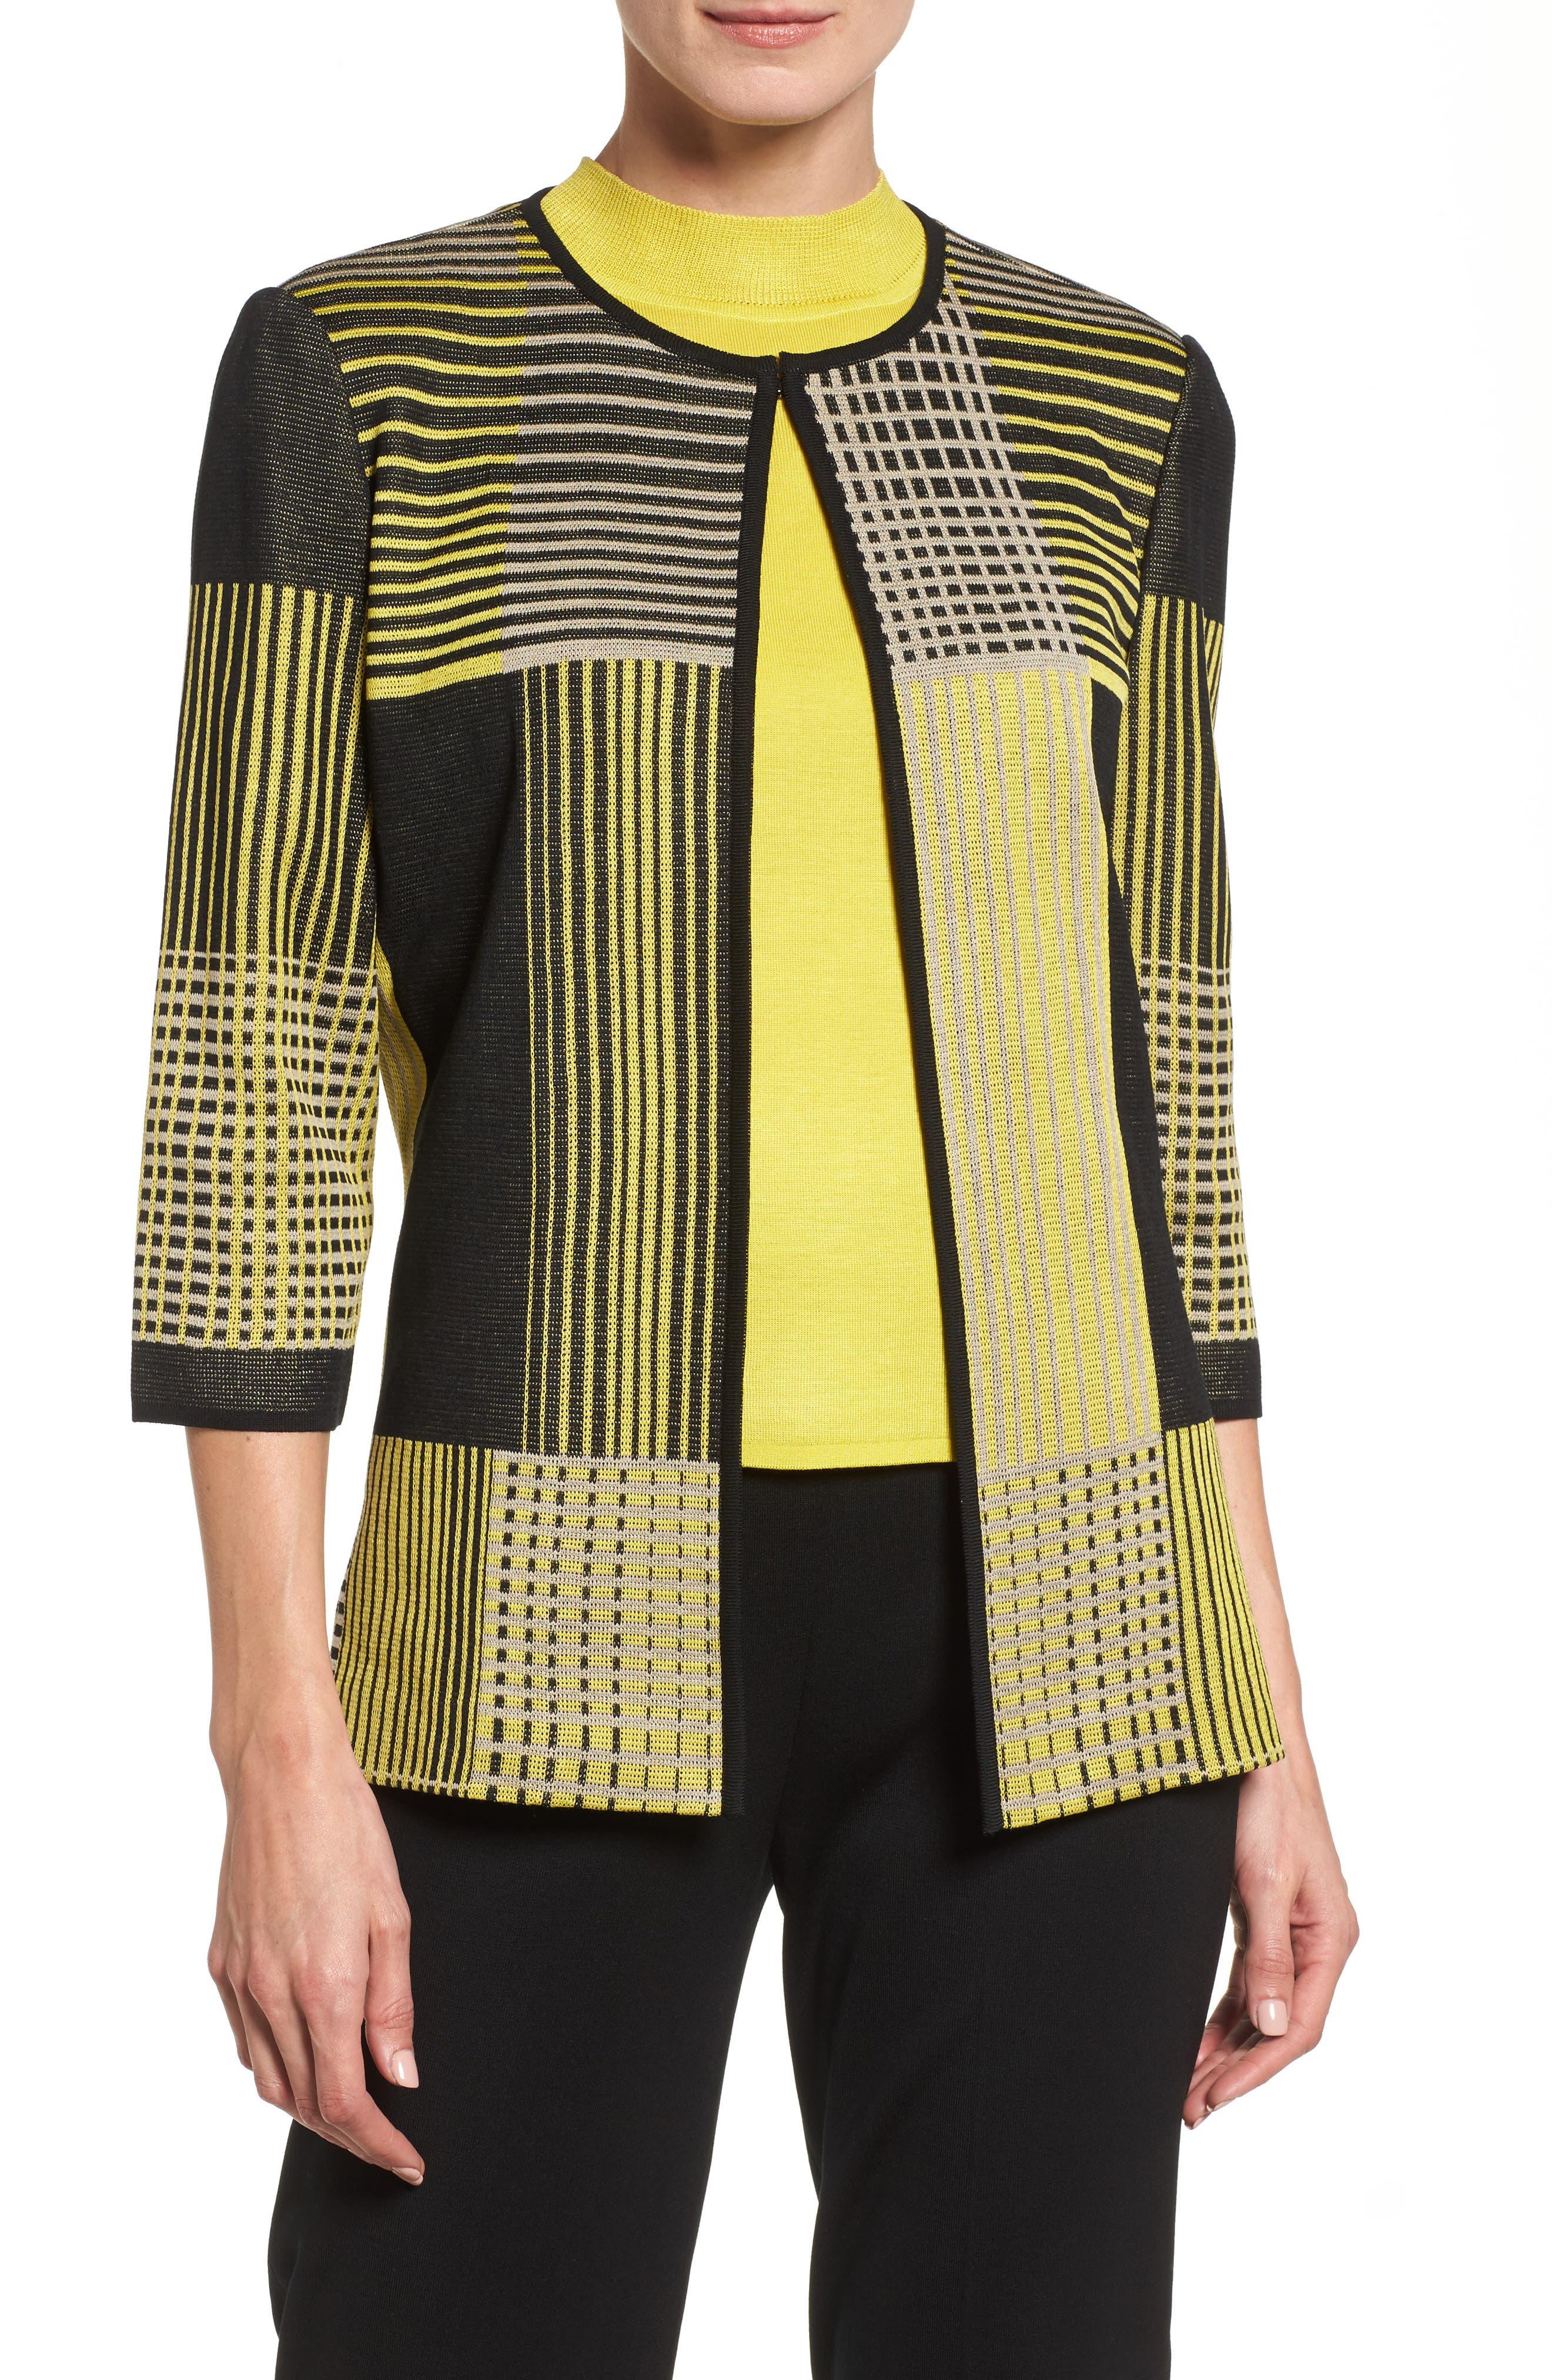 Ming Wang Patchwork Knit Jacket